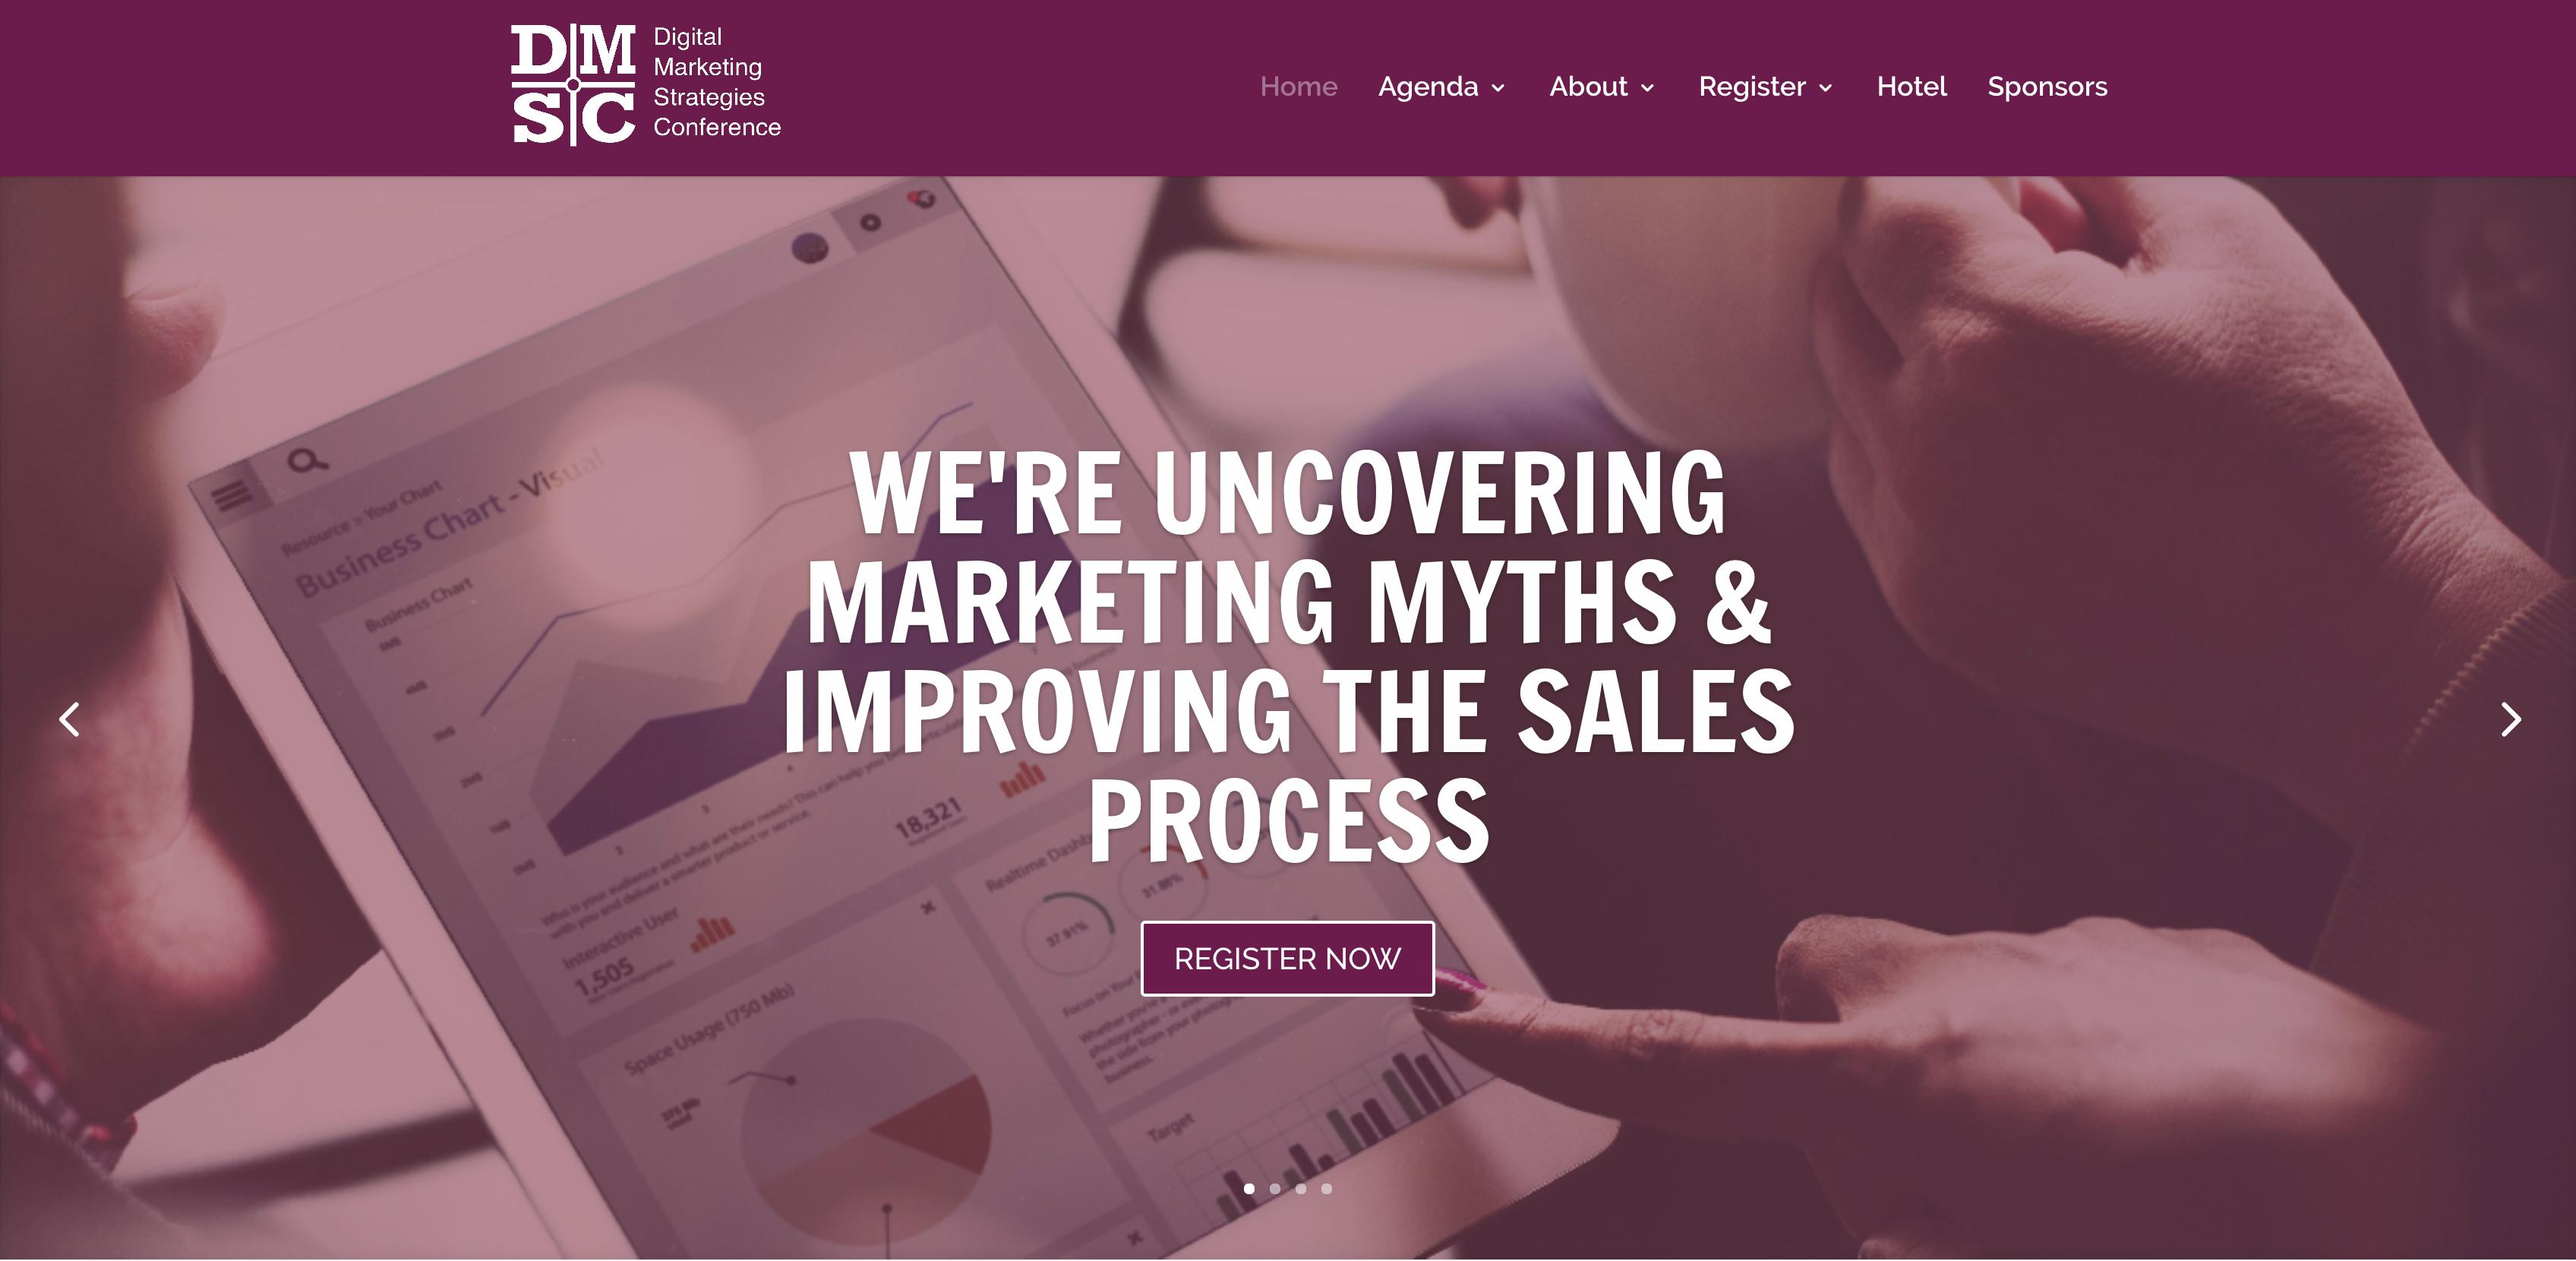 Digital Marketing Strategies Conference for Dealers